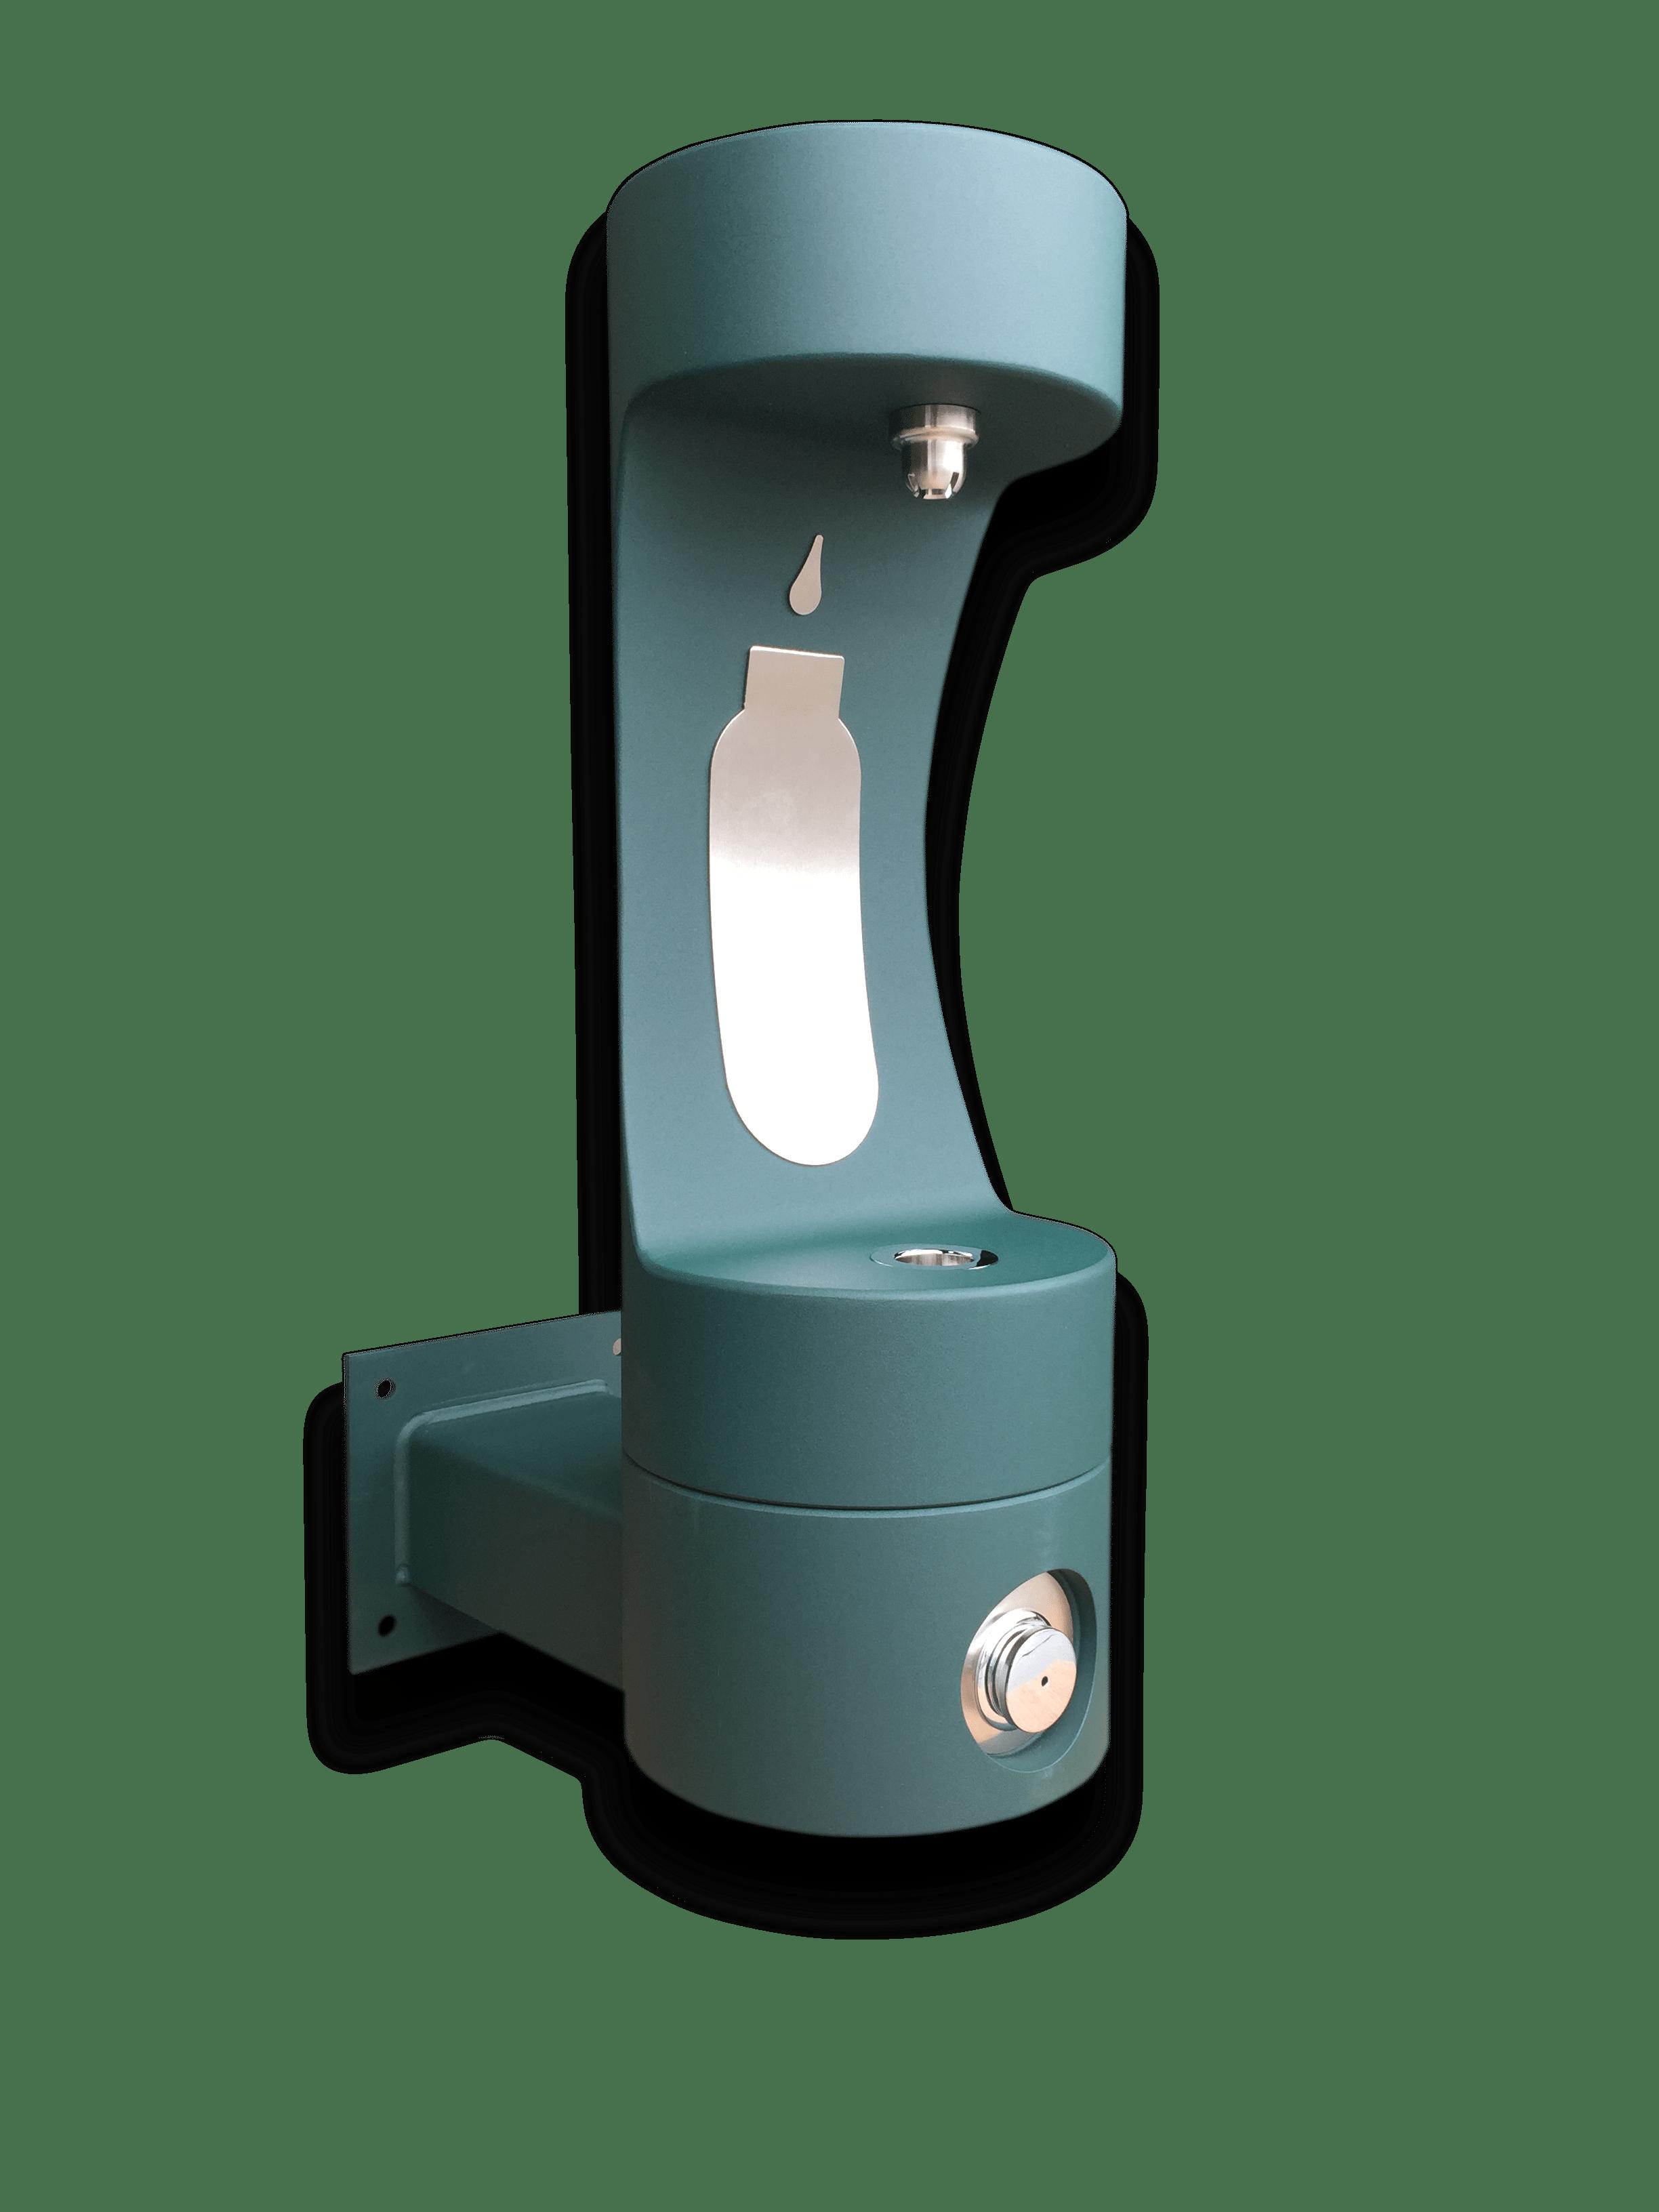 Halsey Taylor 4405BF - Endura II Tubular Outdoor Bottle Filling